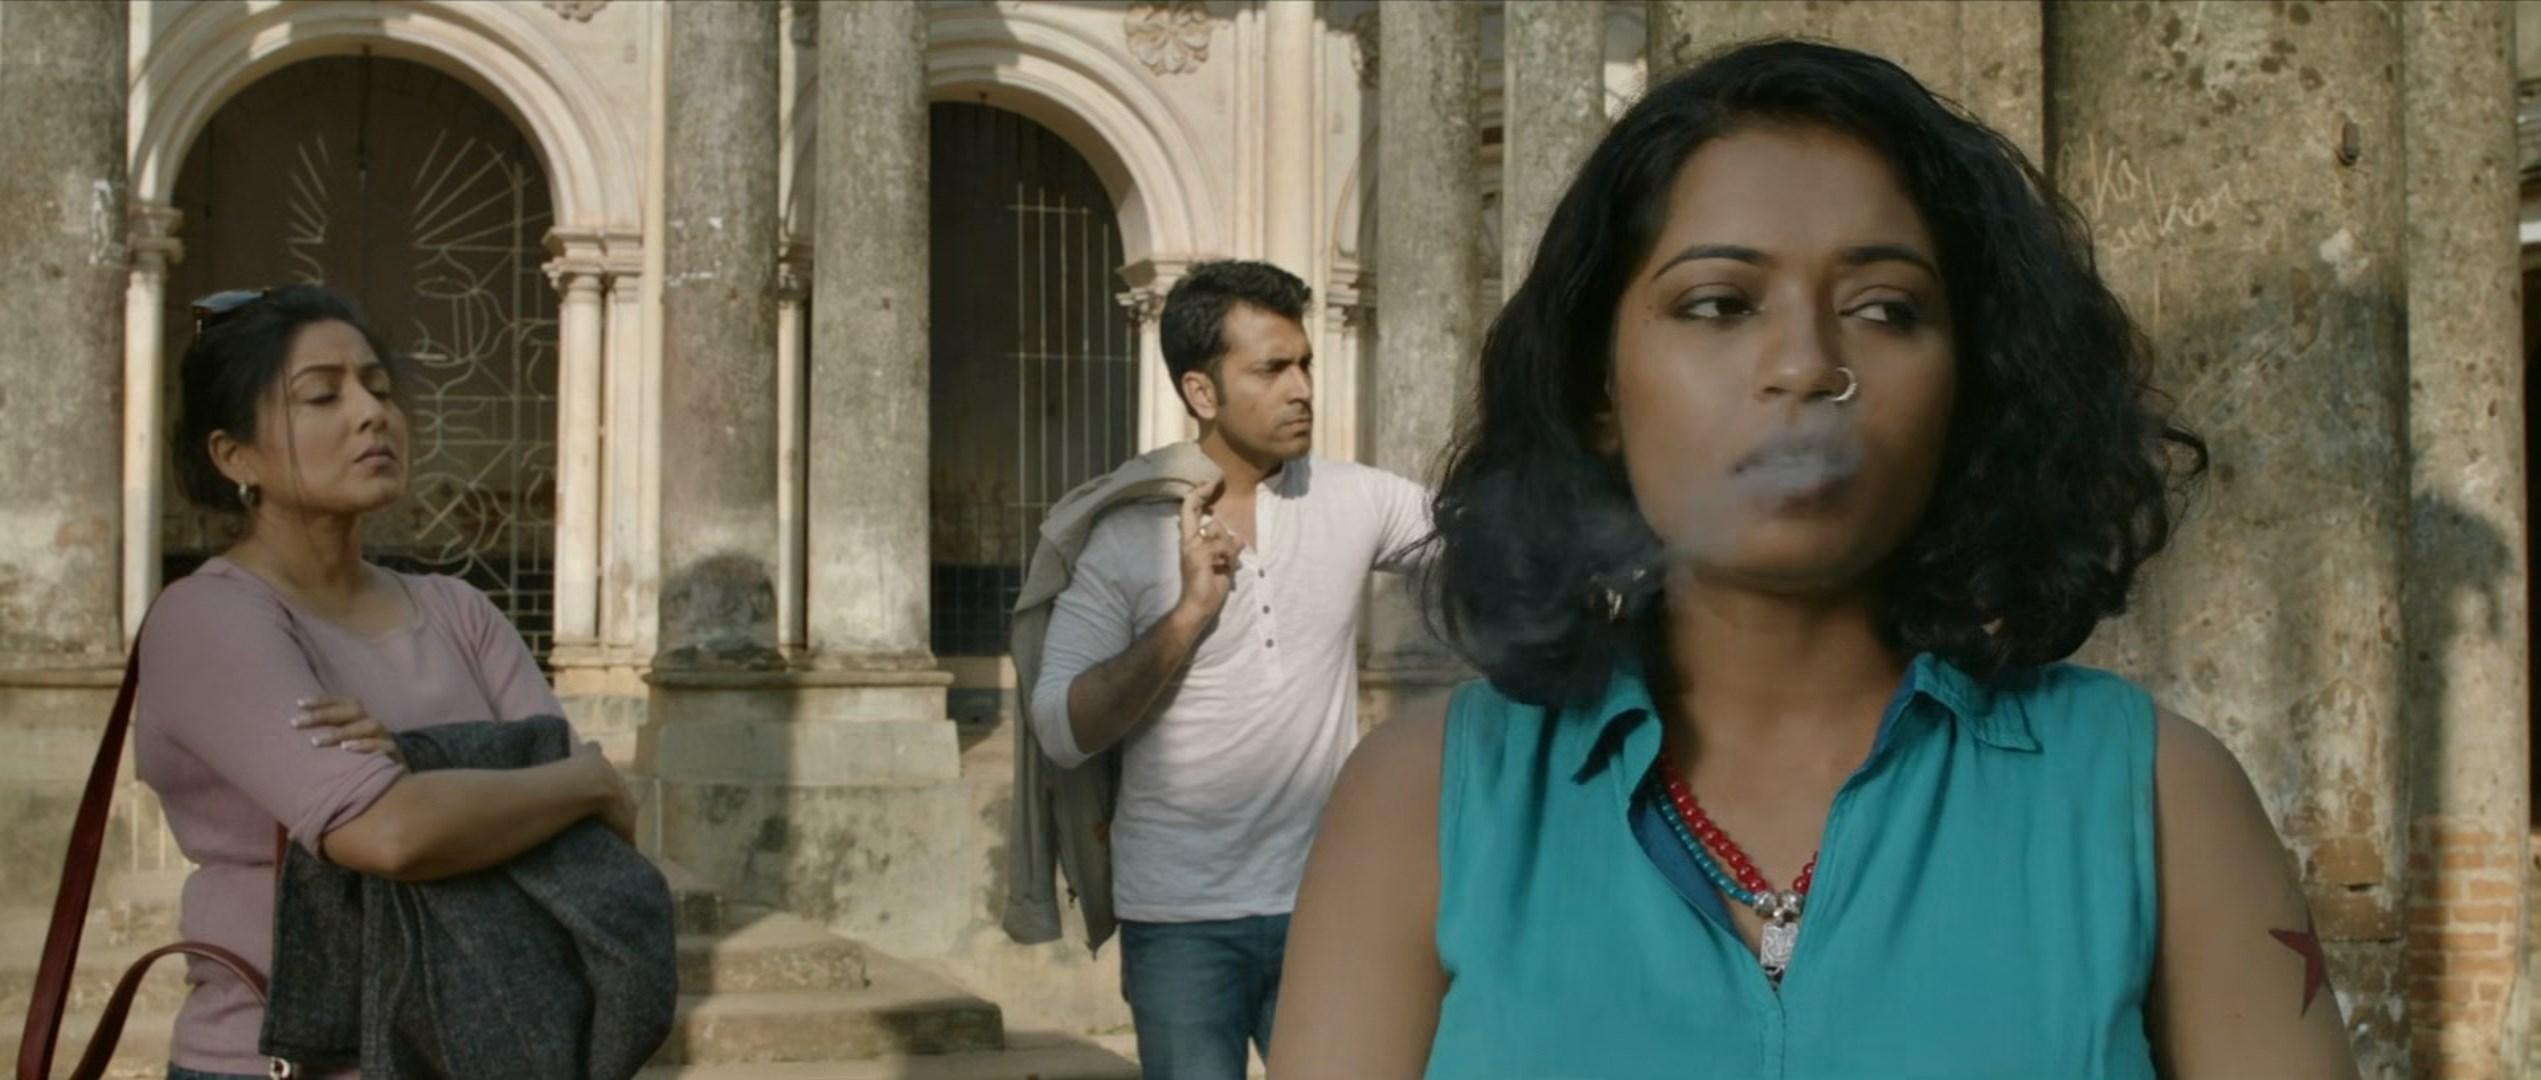 Meghnadbodh Rohoshyo 2017 Bengali 1080P WEBRiP.mkv snapshot 02.23.28.646